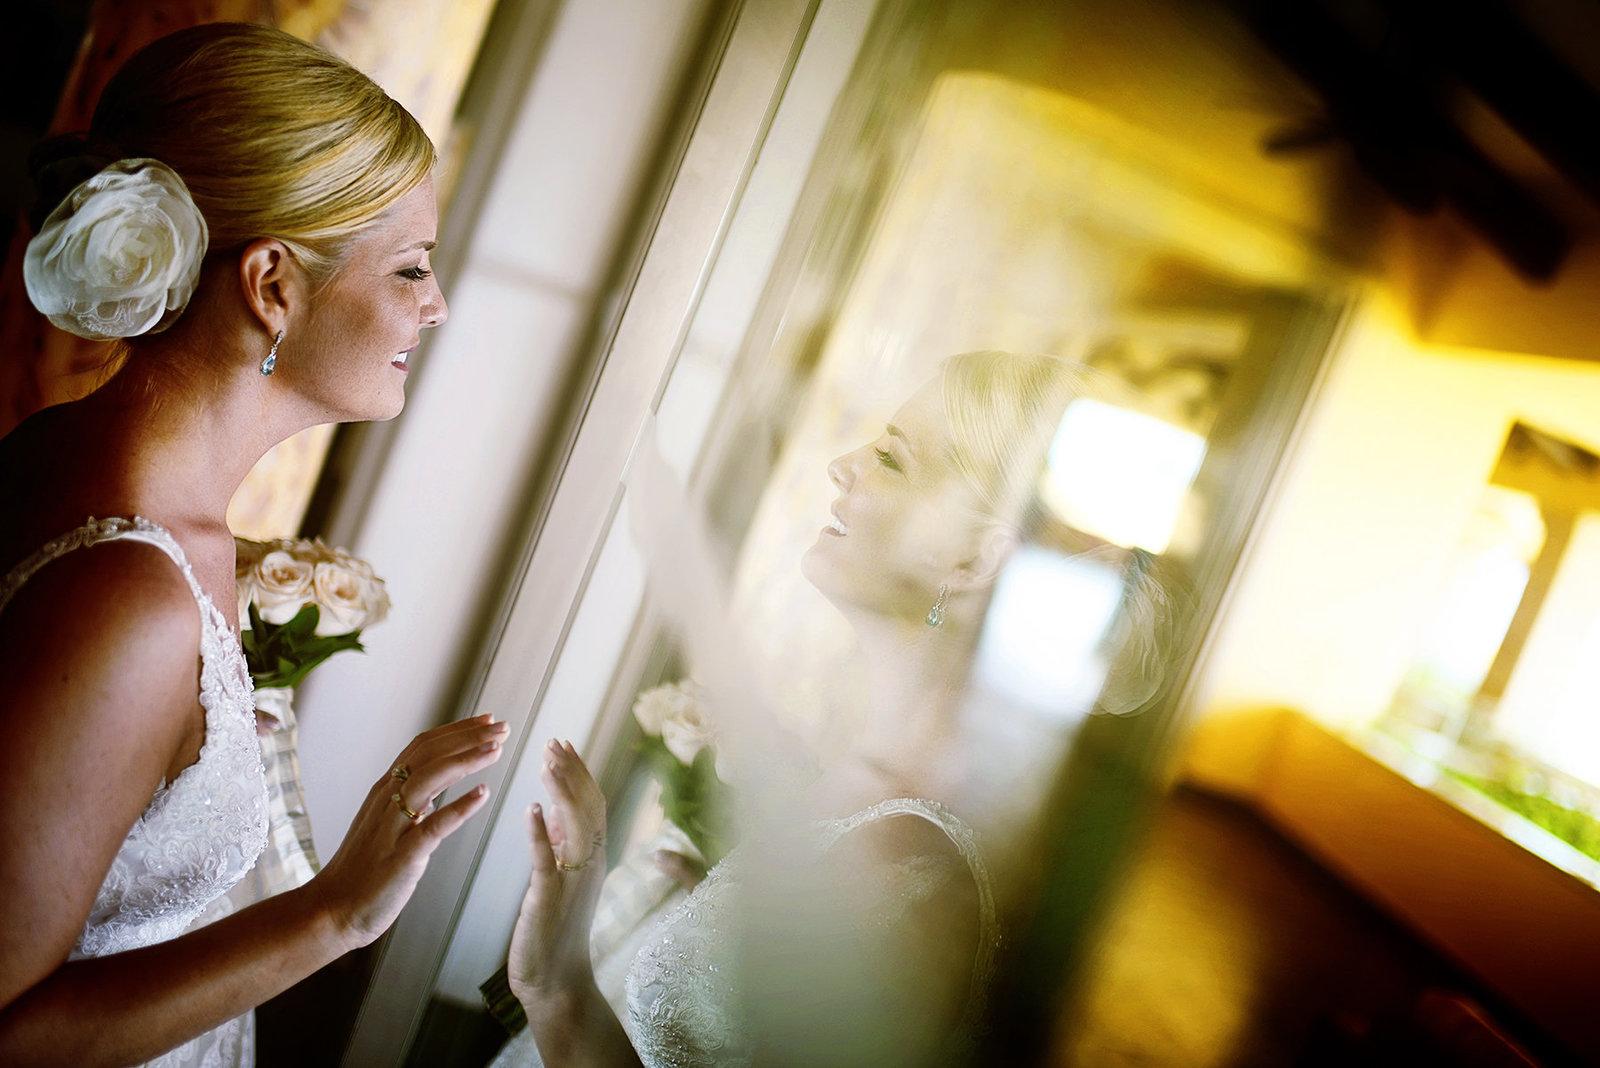 barcelo maya beach resort wedding destination wedding photographer bryan newfield photography 14